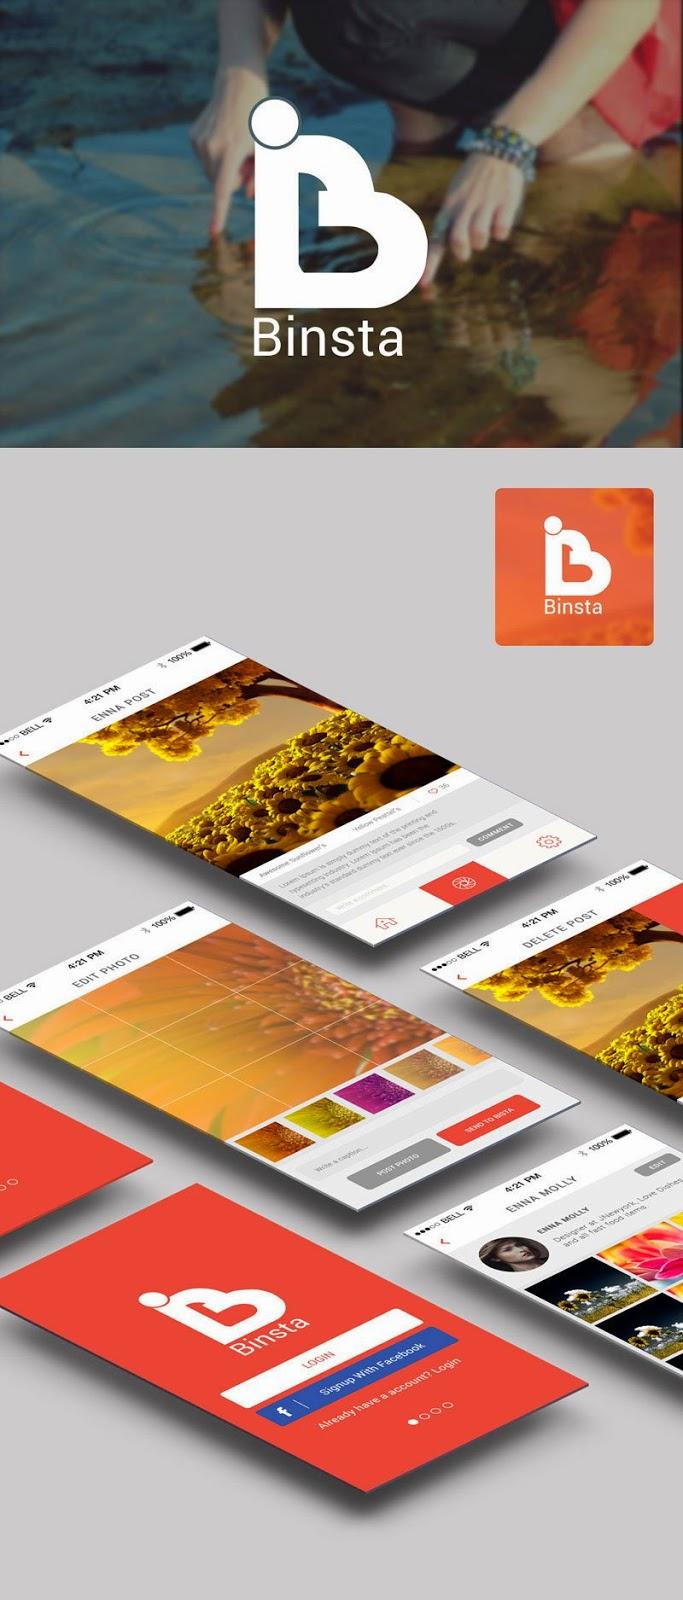 Binsta Mobile App Screens UI PSD